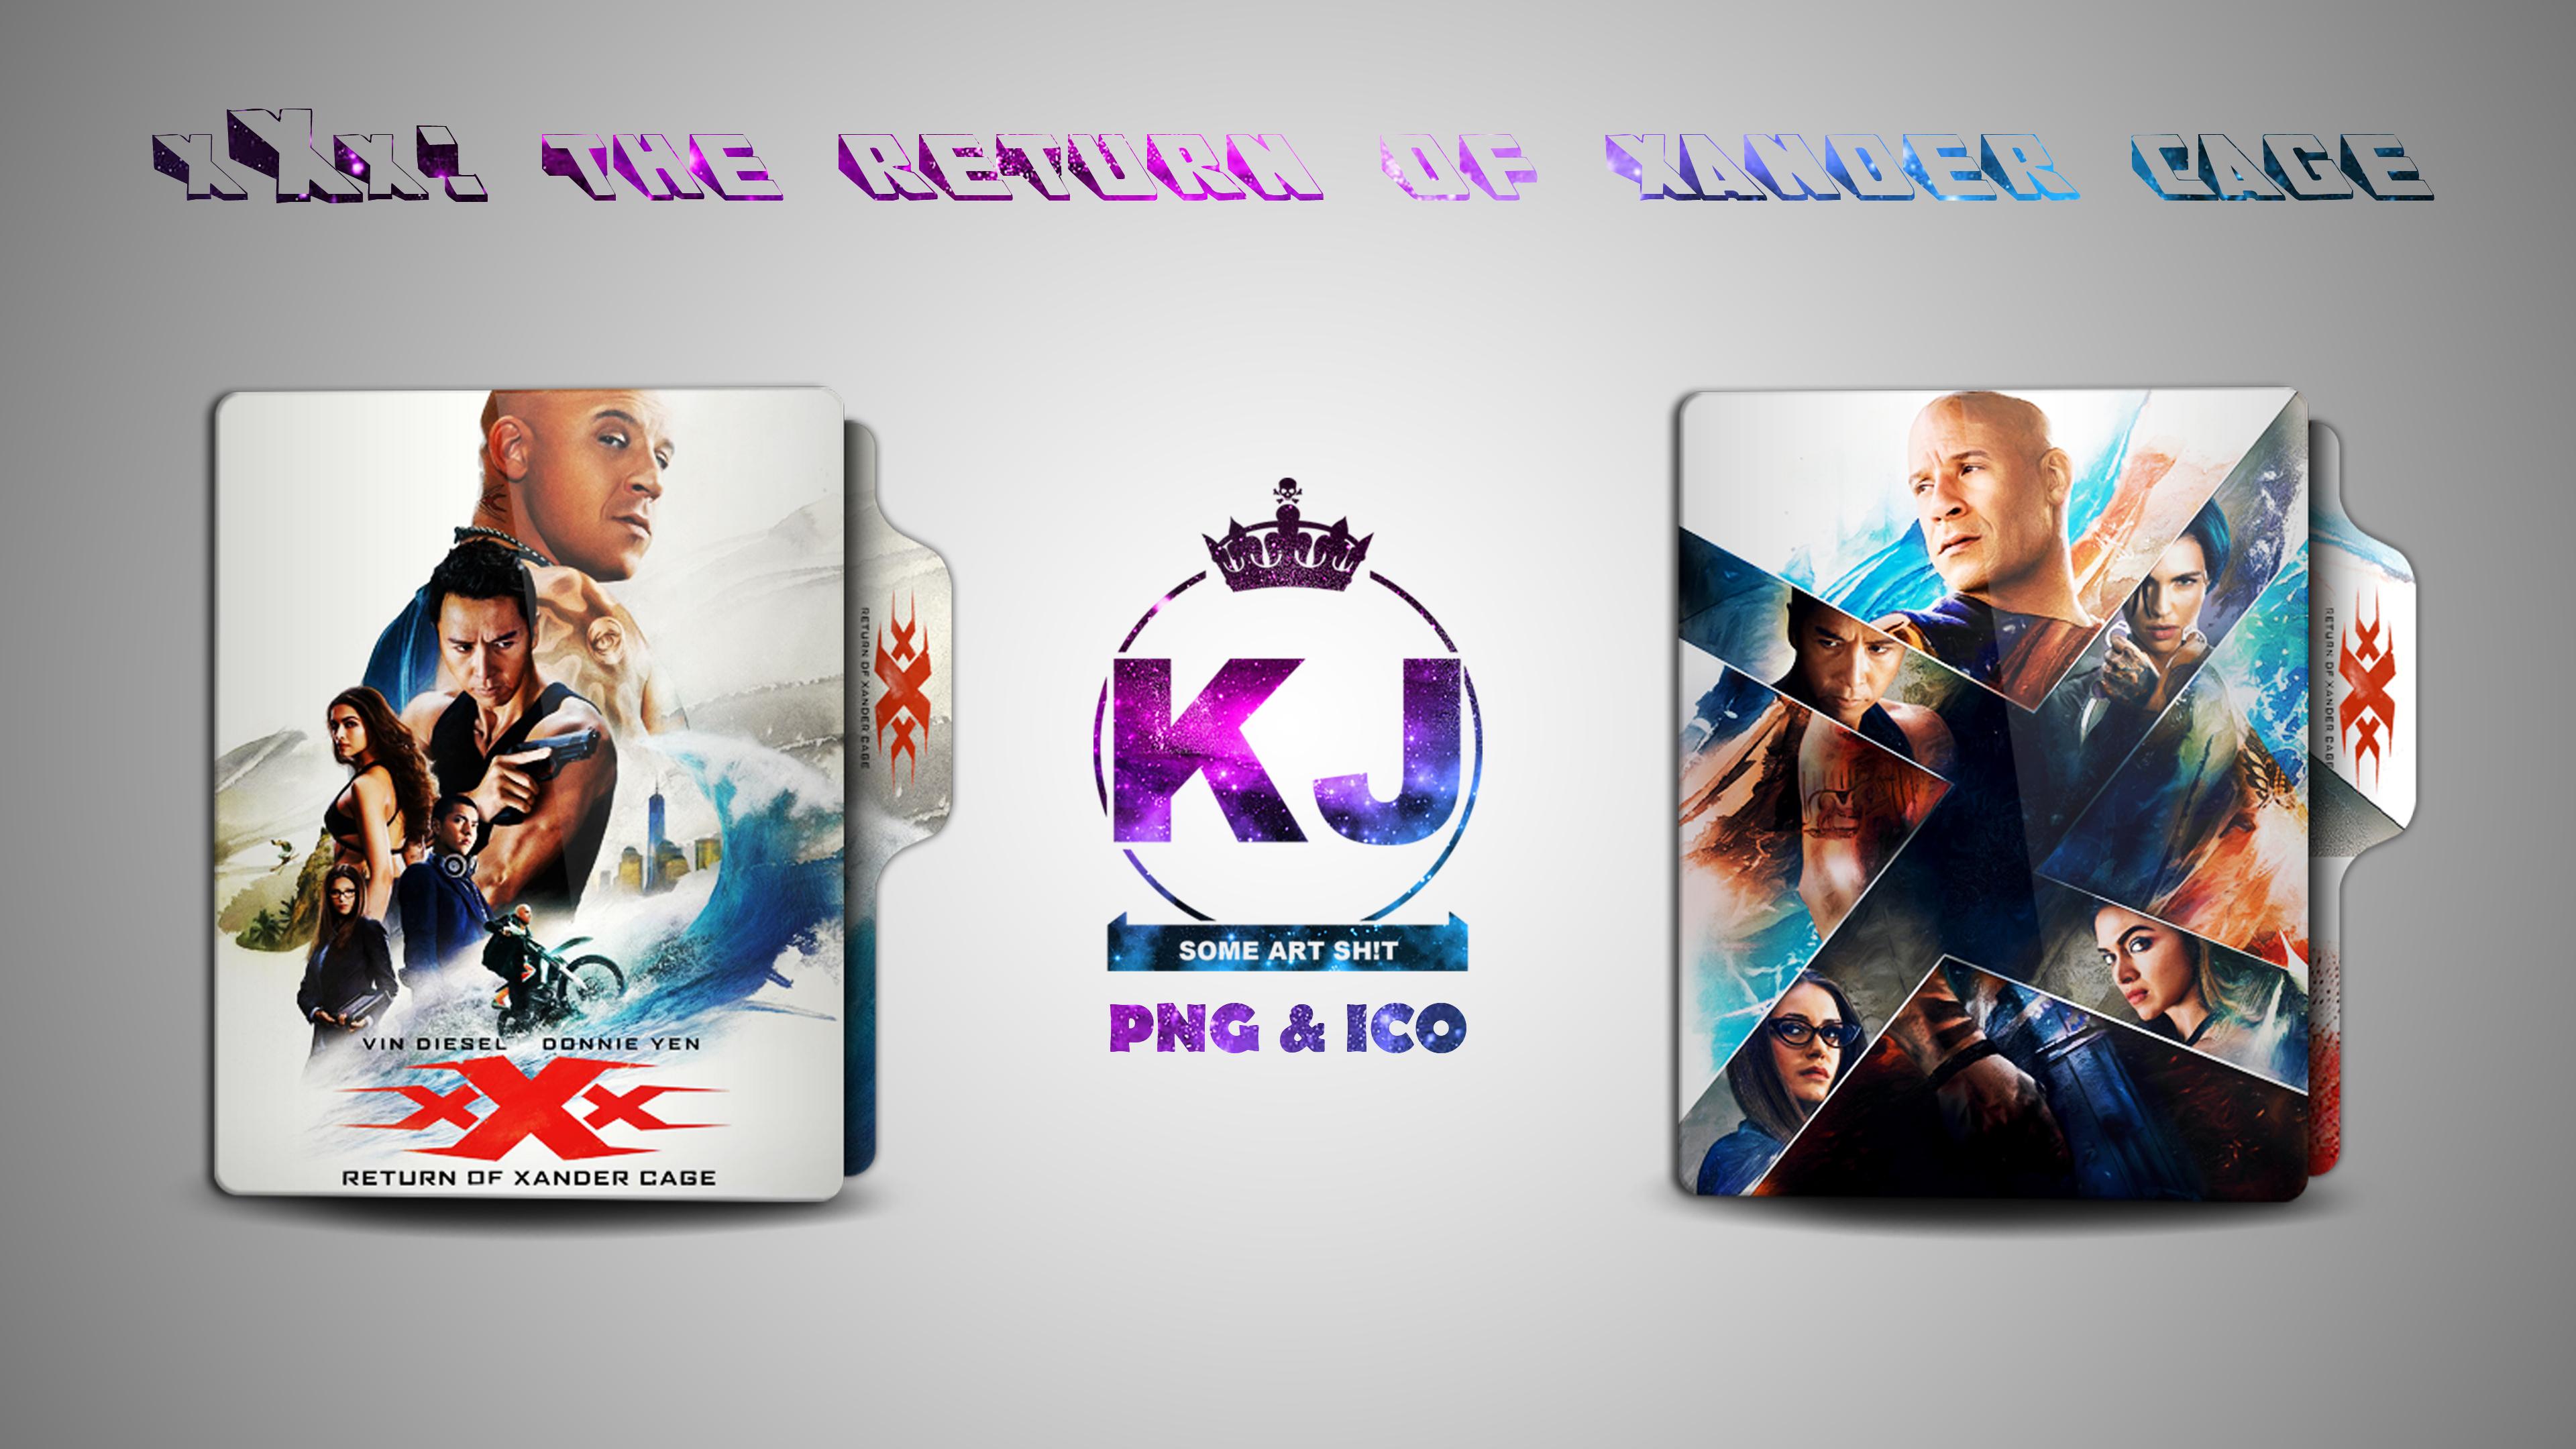 Xxx Return Of Xander Cage 2017 Folder Icon By Kingjoe93 On Deviantart